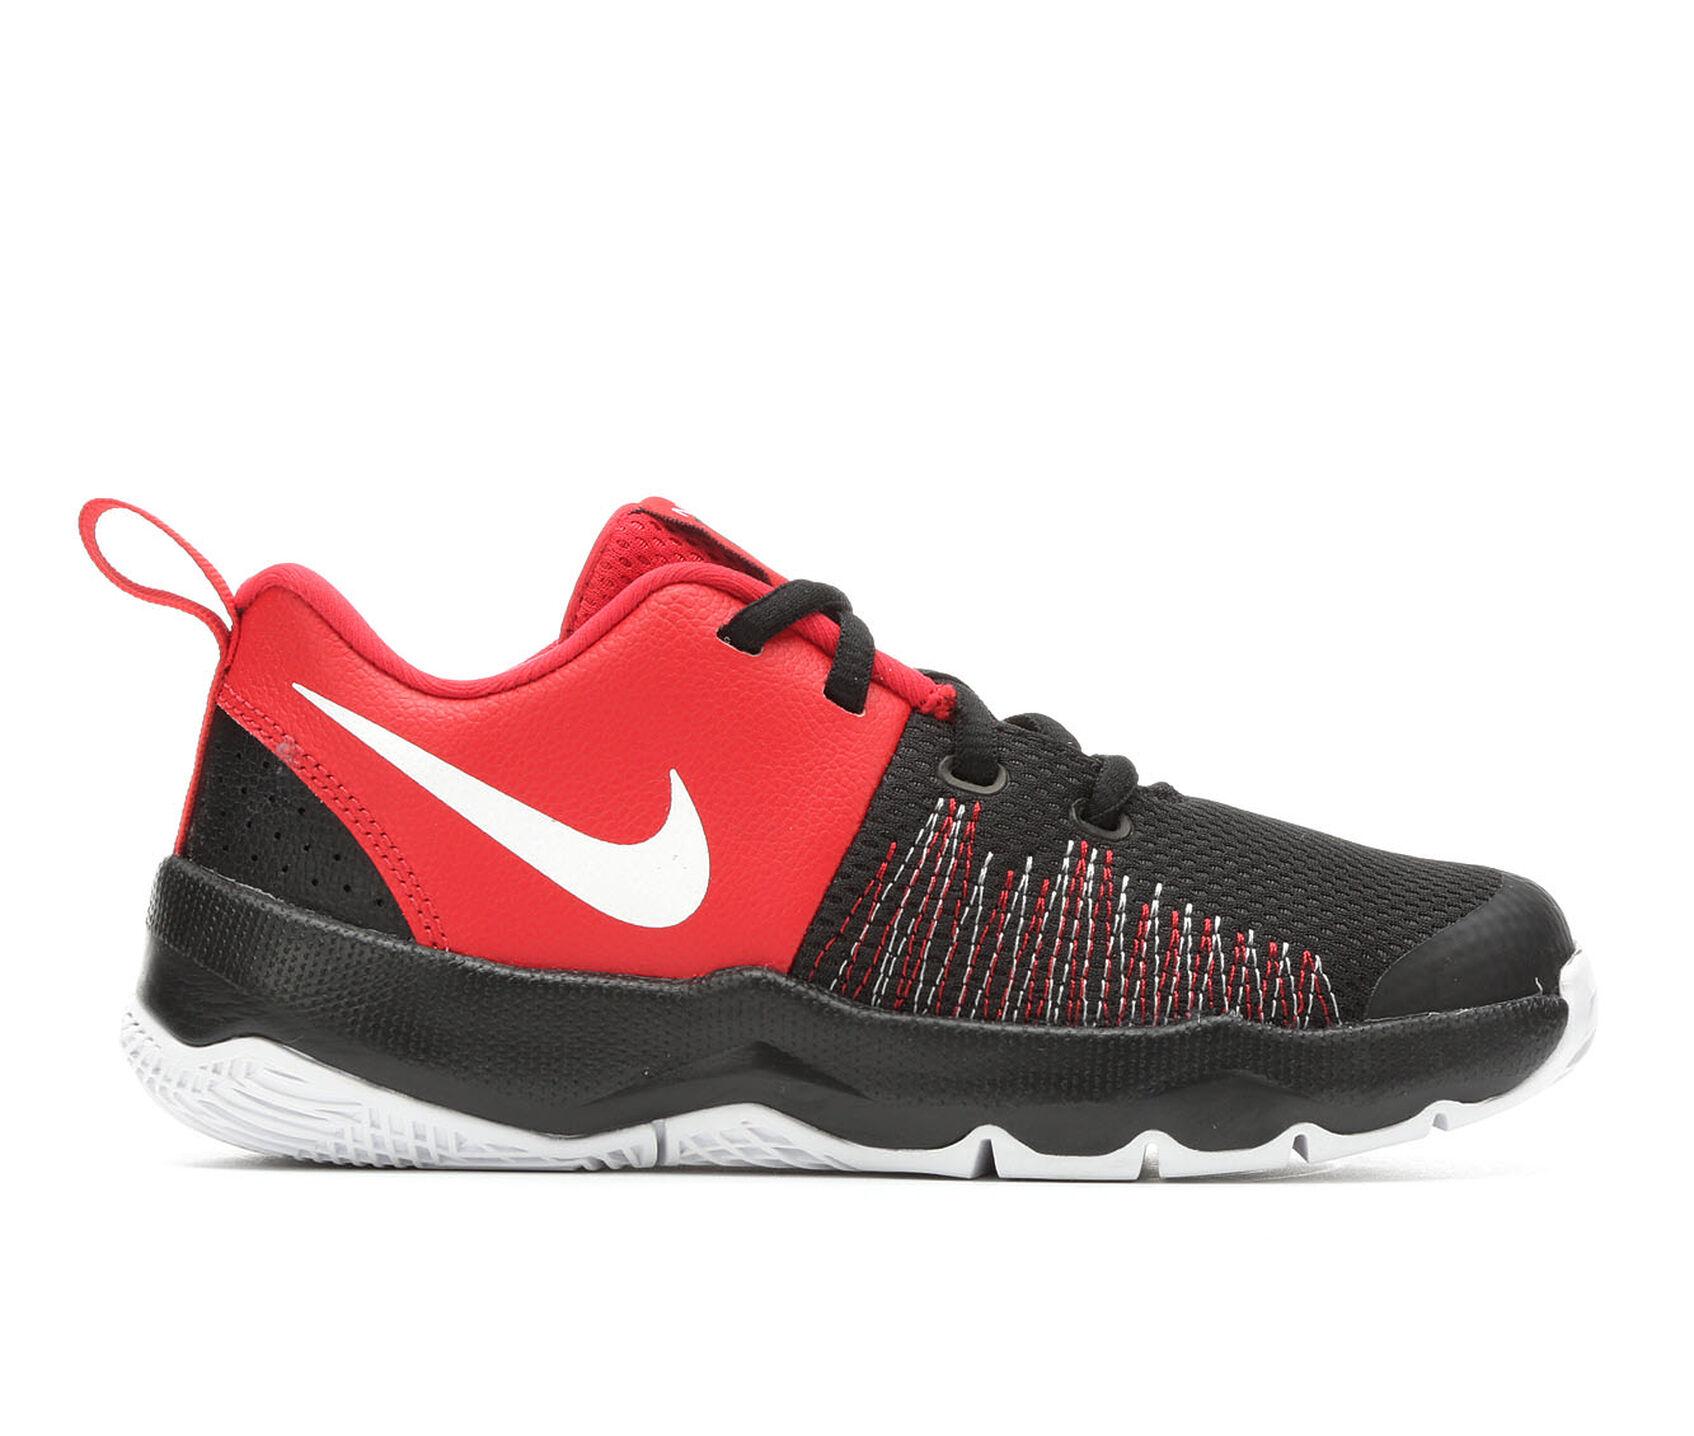 finest selection eb053 da309 Nike Little Kid Team Hustle Quick Basketball Shoes. Previous  Preschool ...